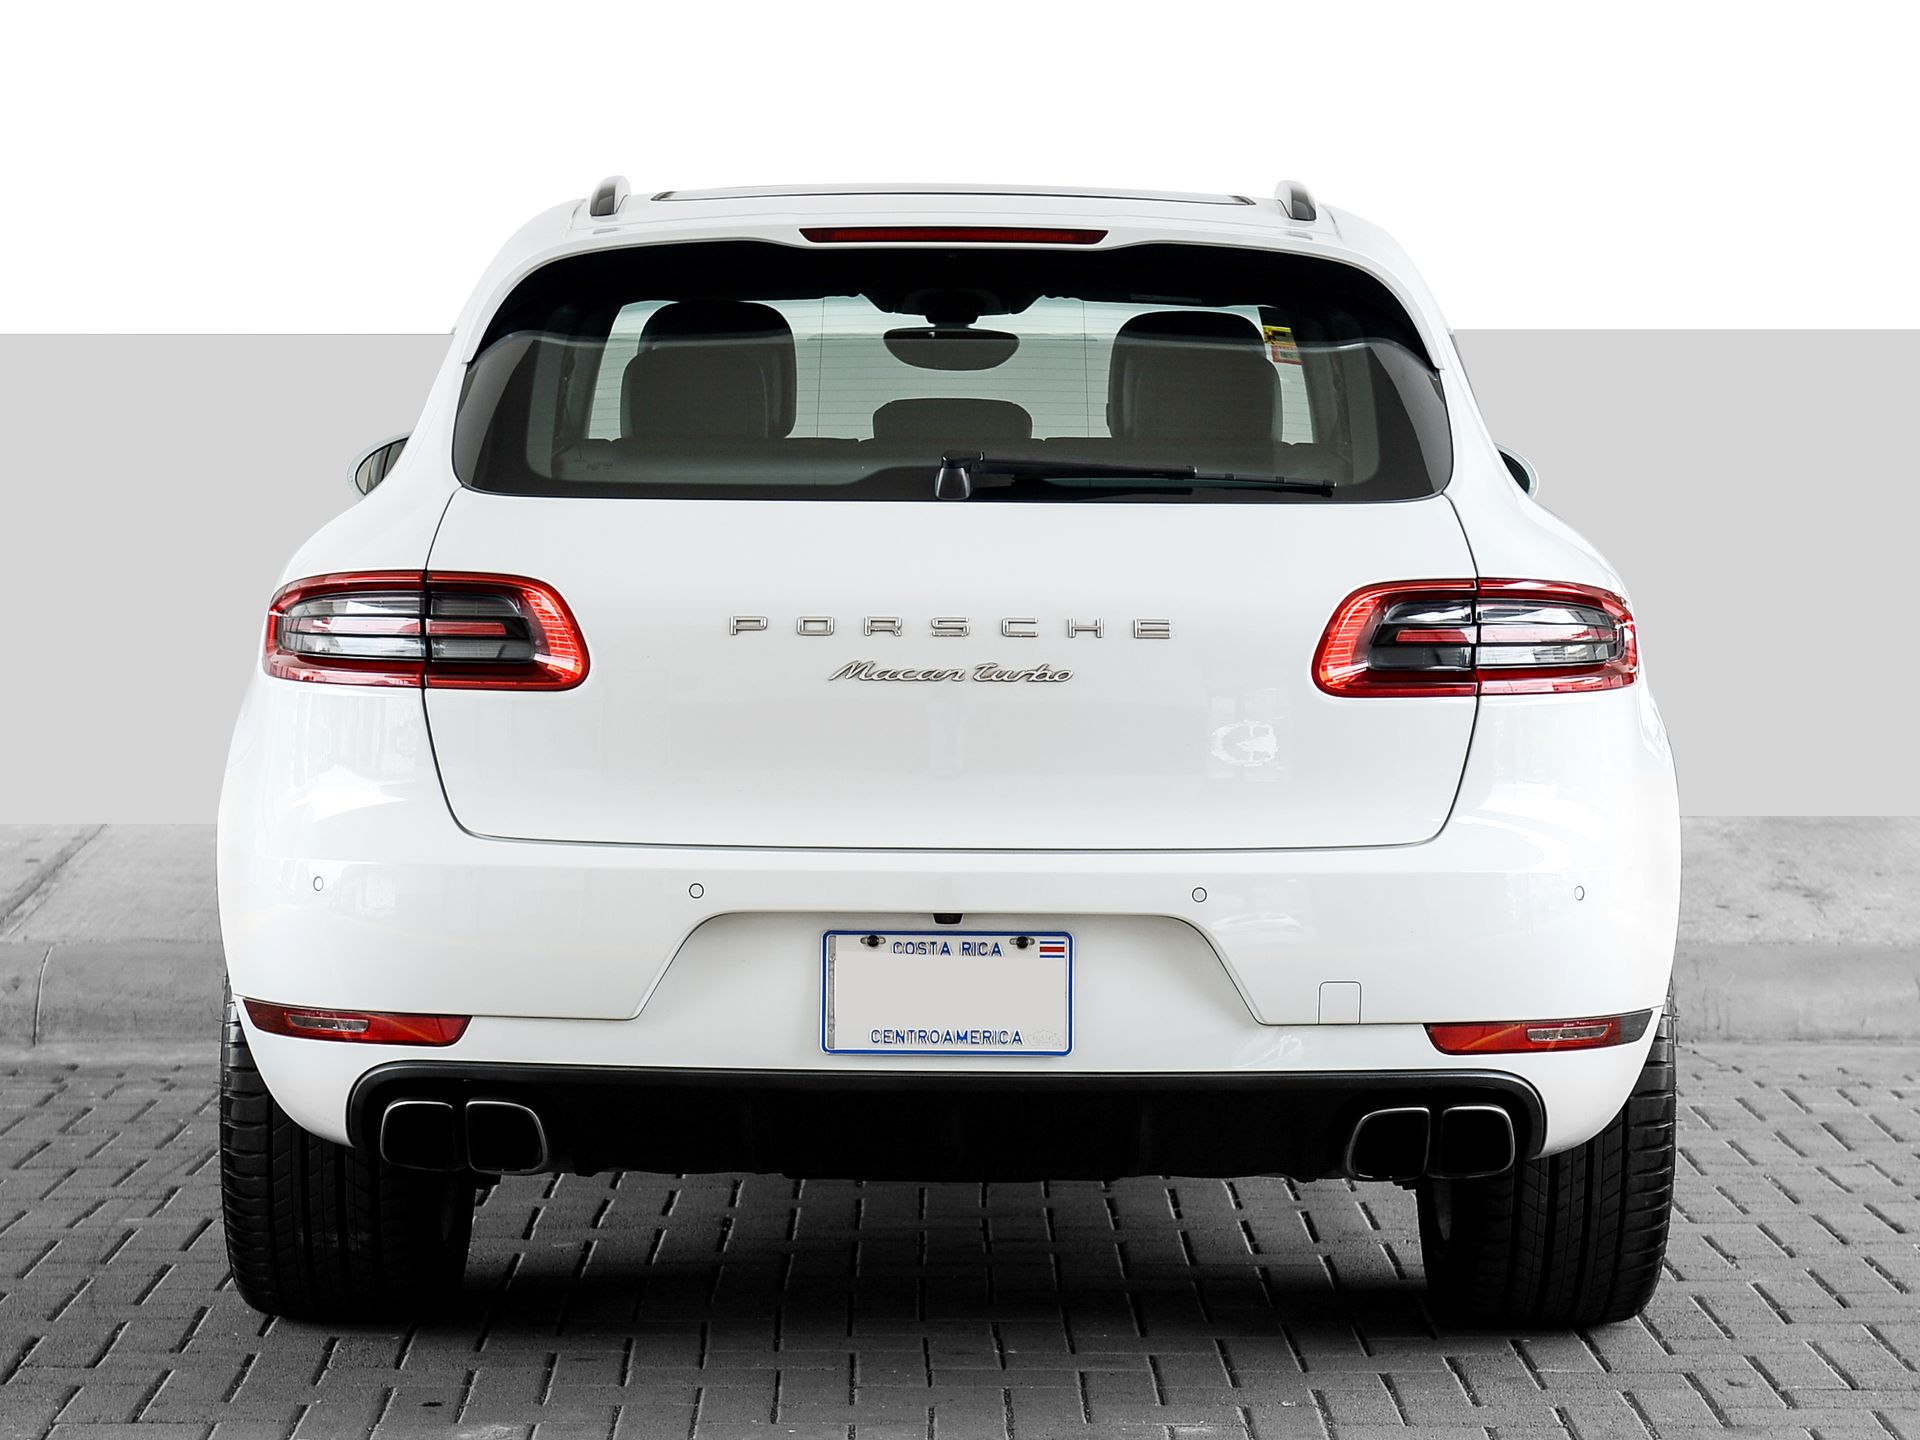 2015 Porsche Macan Turbo – 4